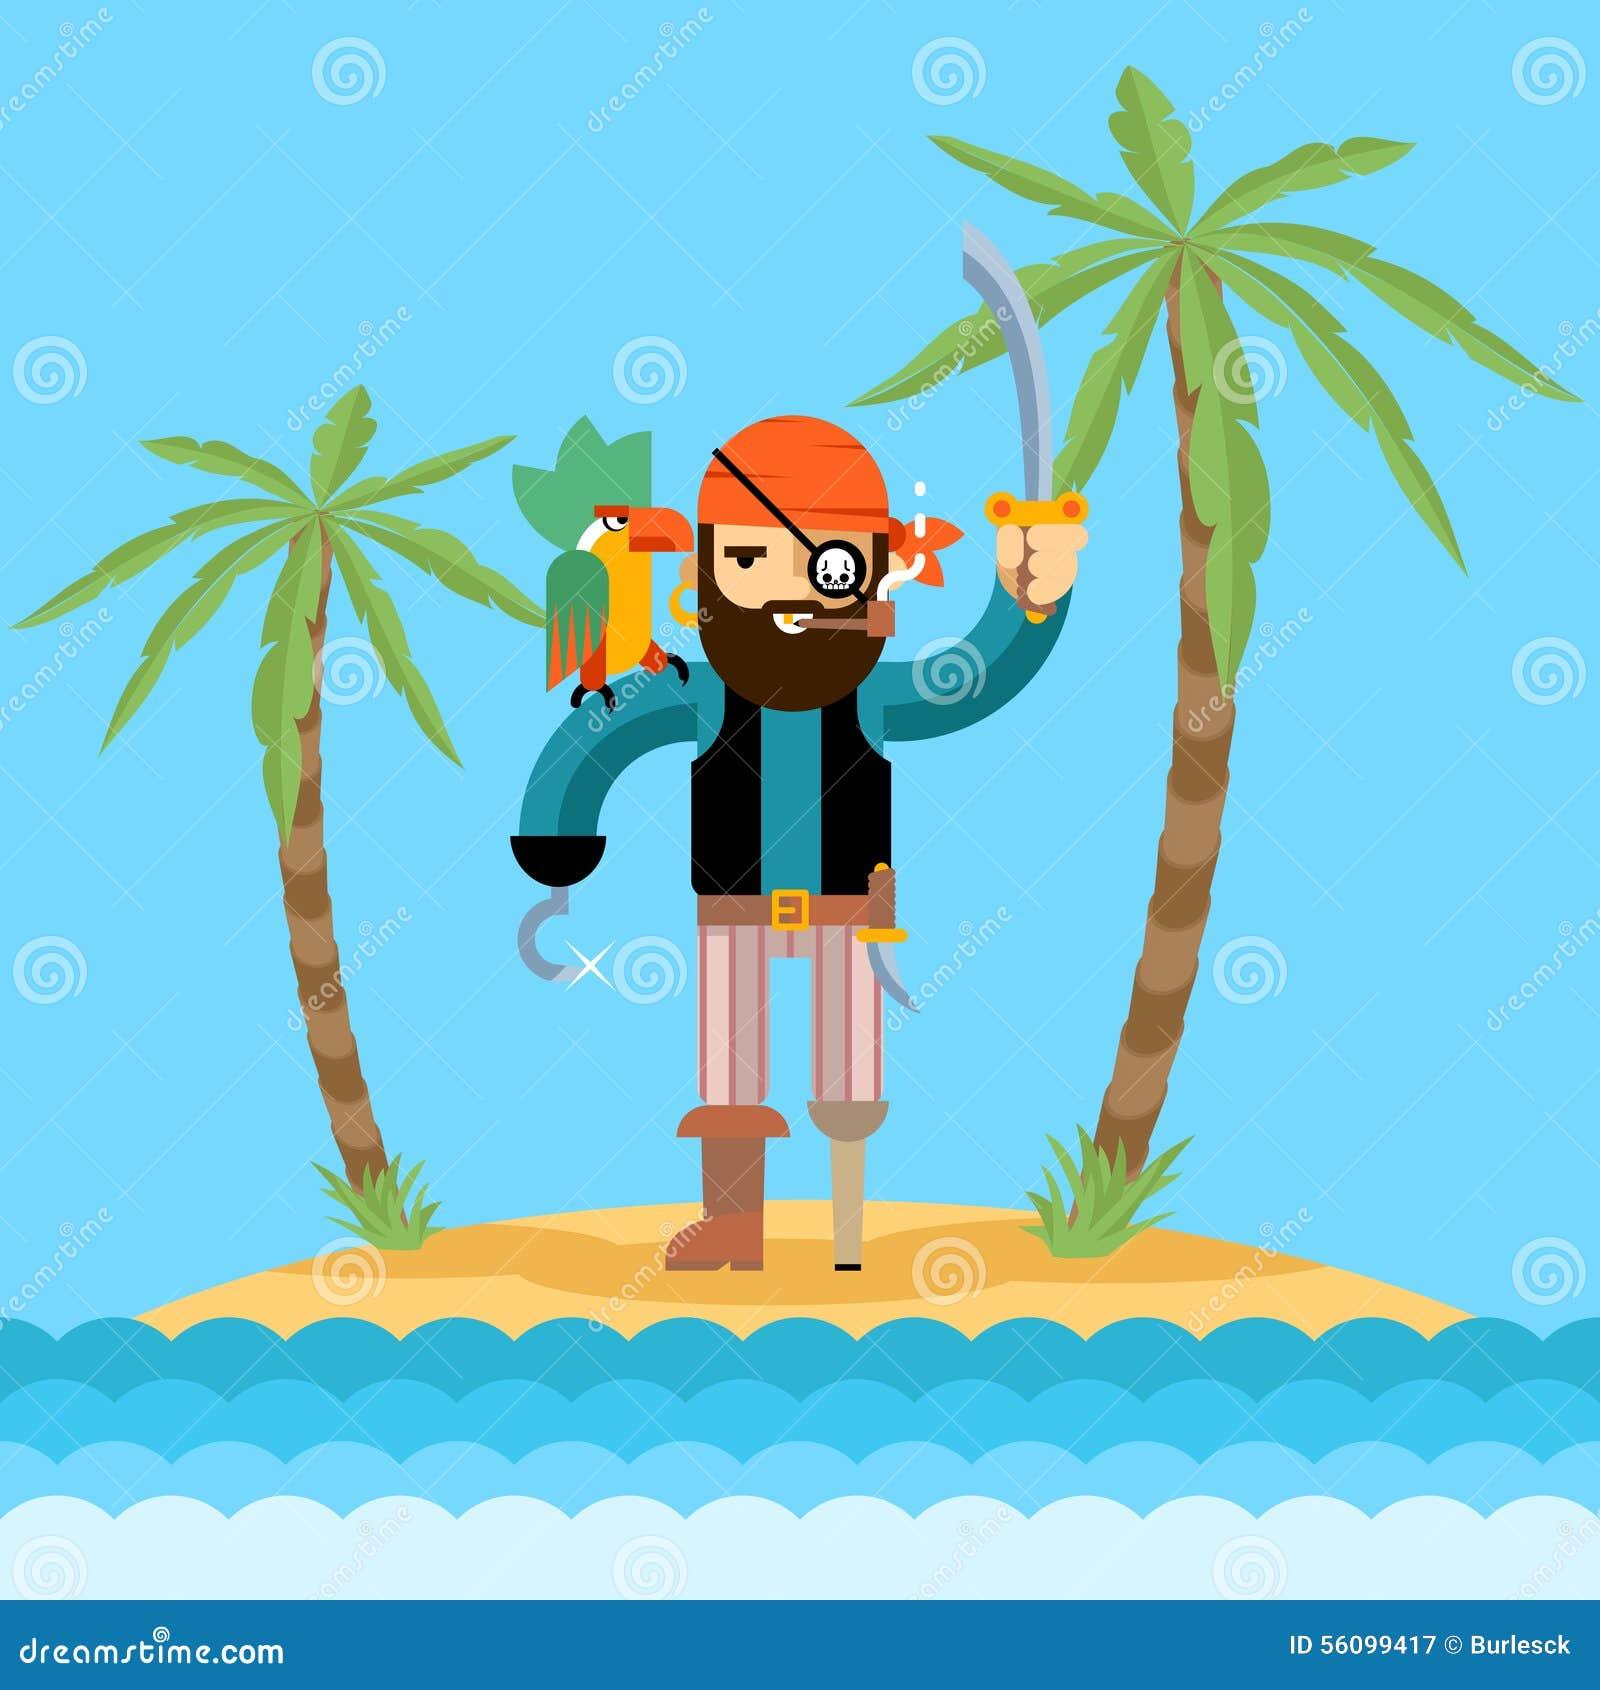 Pirate On Treasure Island Stock Vector. Image Of Design